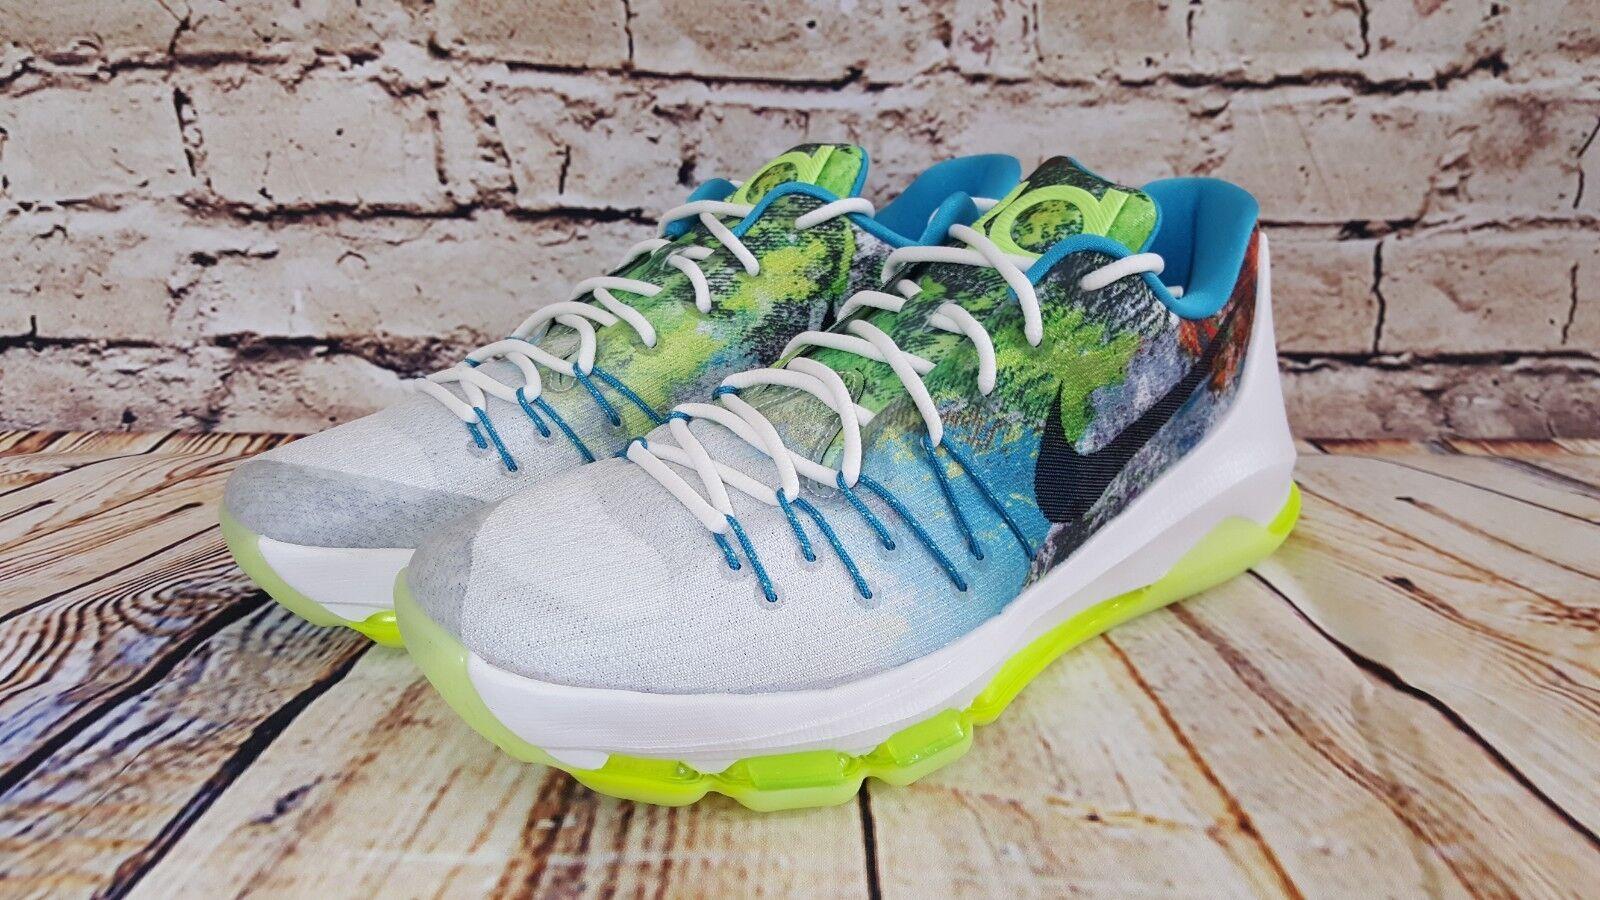 innovative design 35e73 ff55d Мужская спортивная обувь Nike KD 8 N7 Mens White Black Liquid Lime  Basketball Shoes